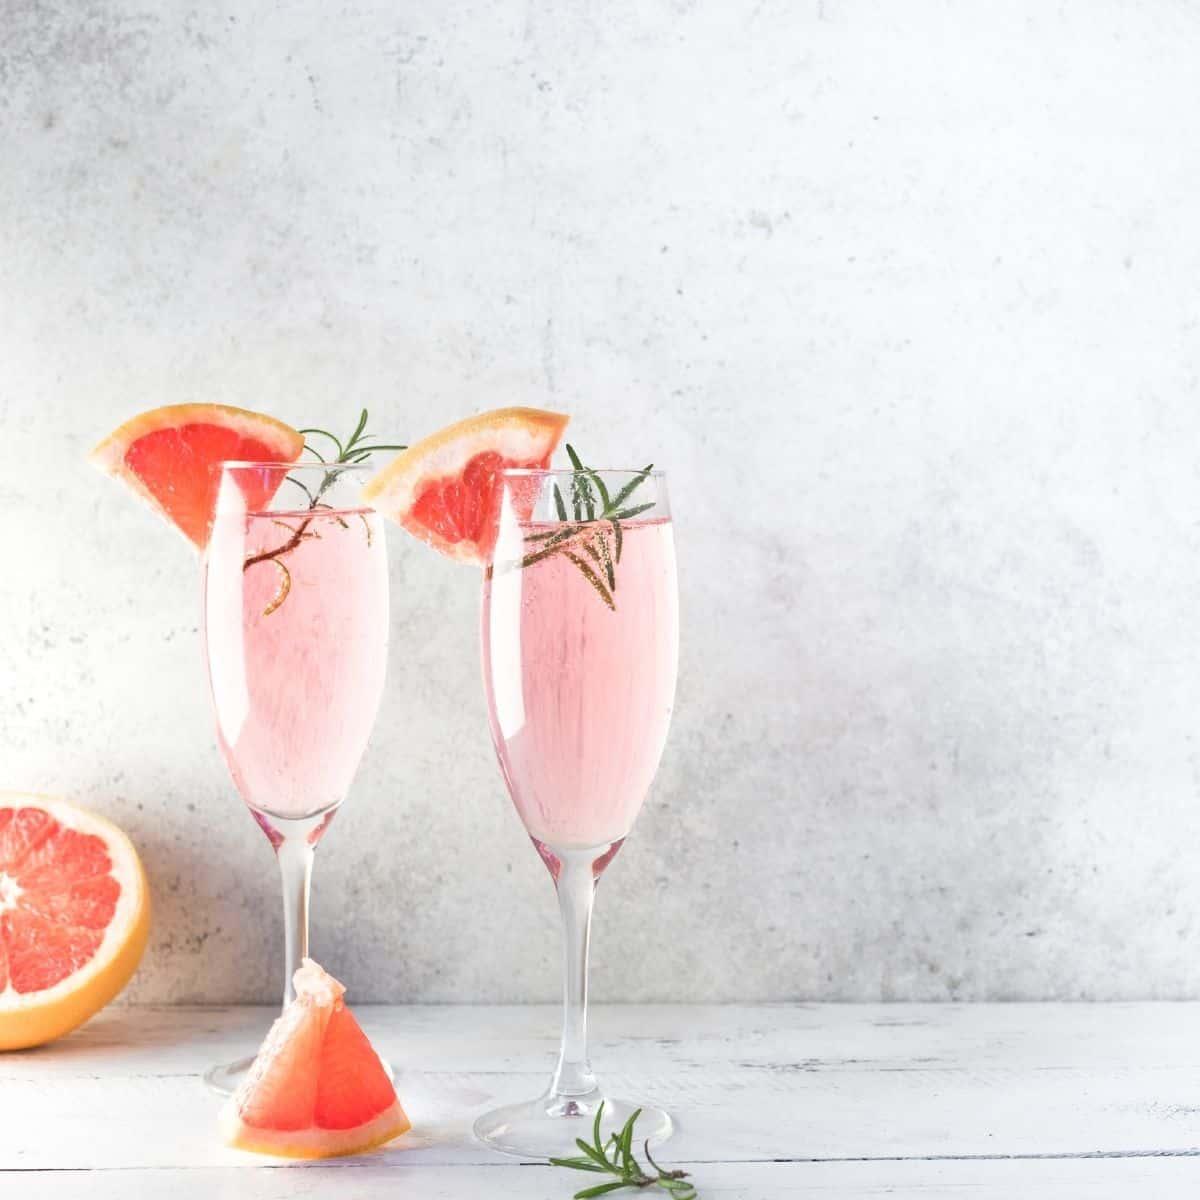 Low Carb Lavender Grapefruit Mimosa FI